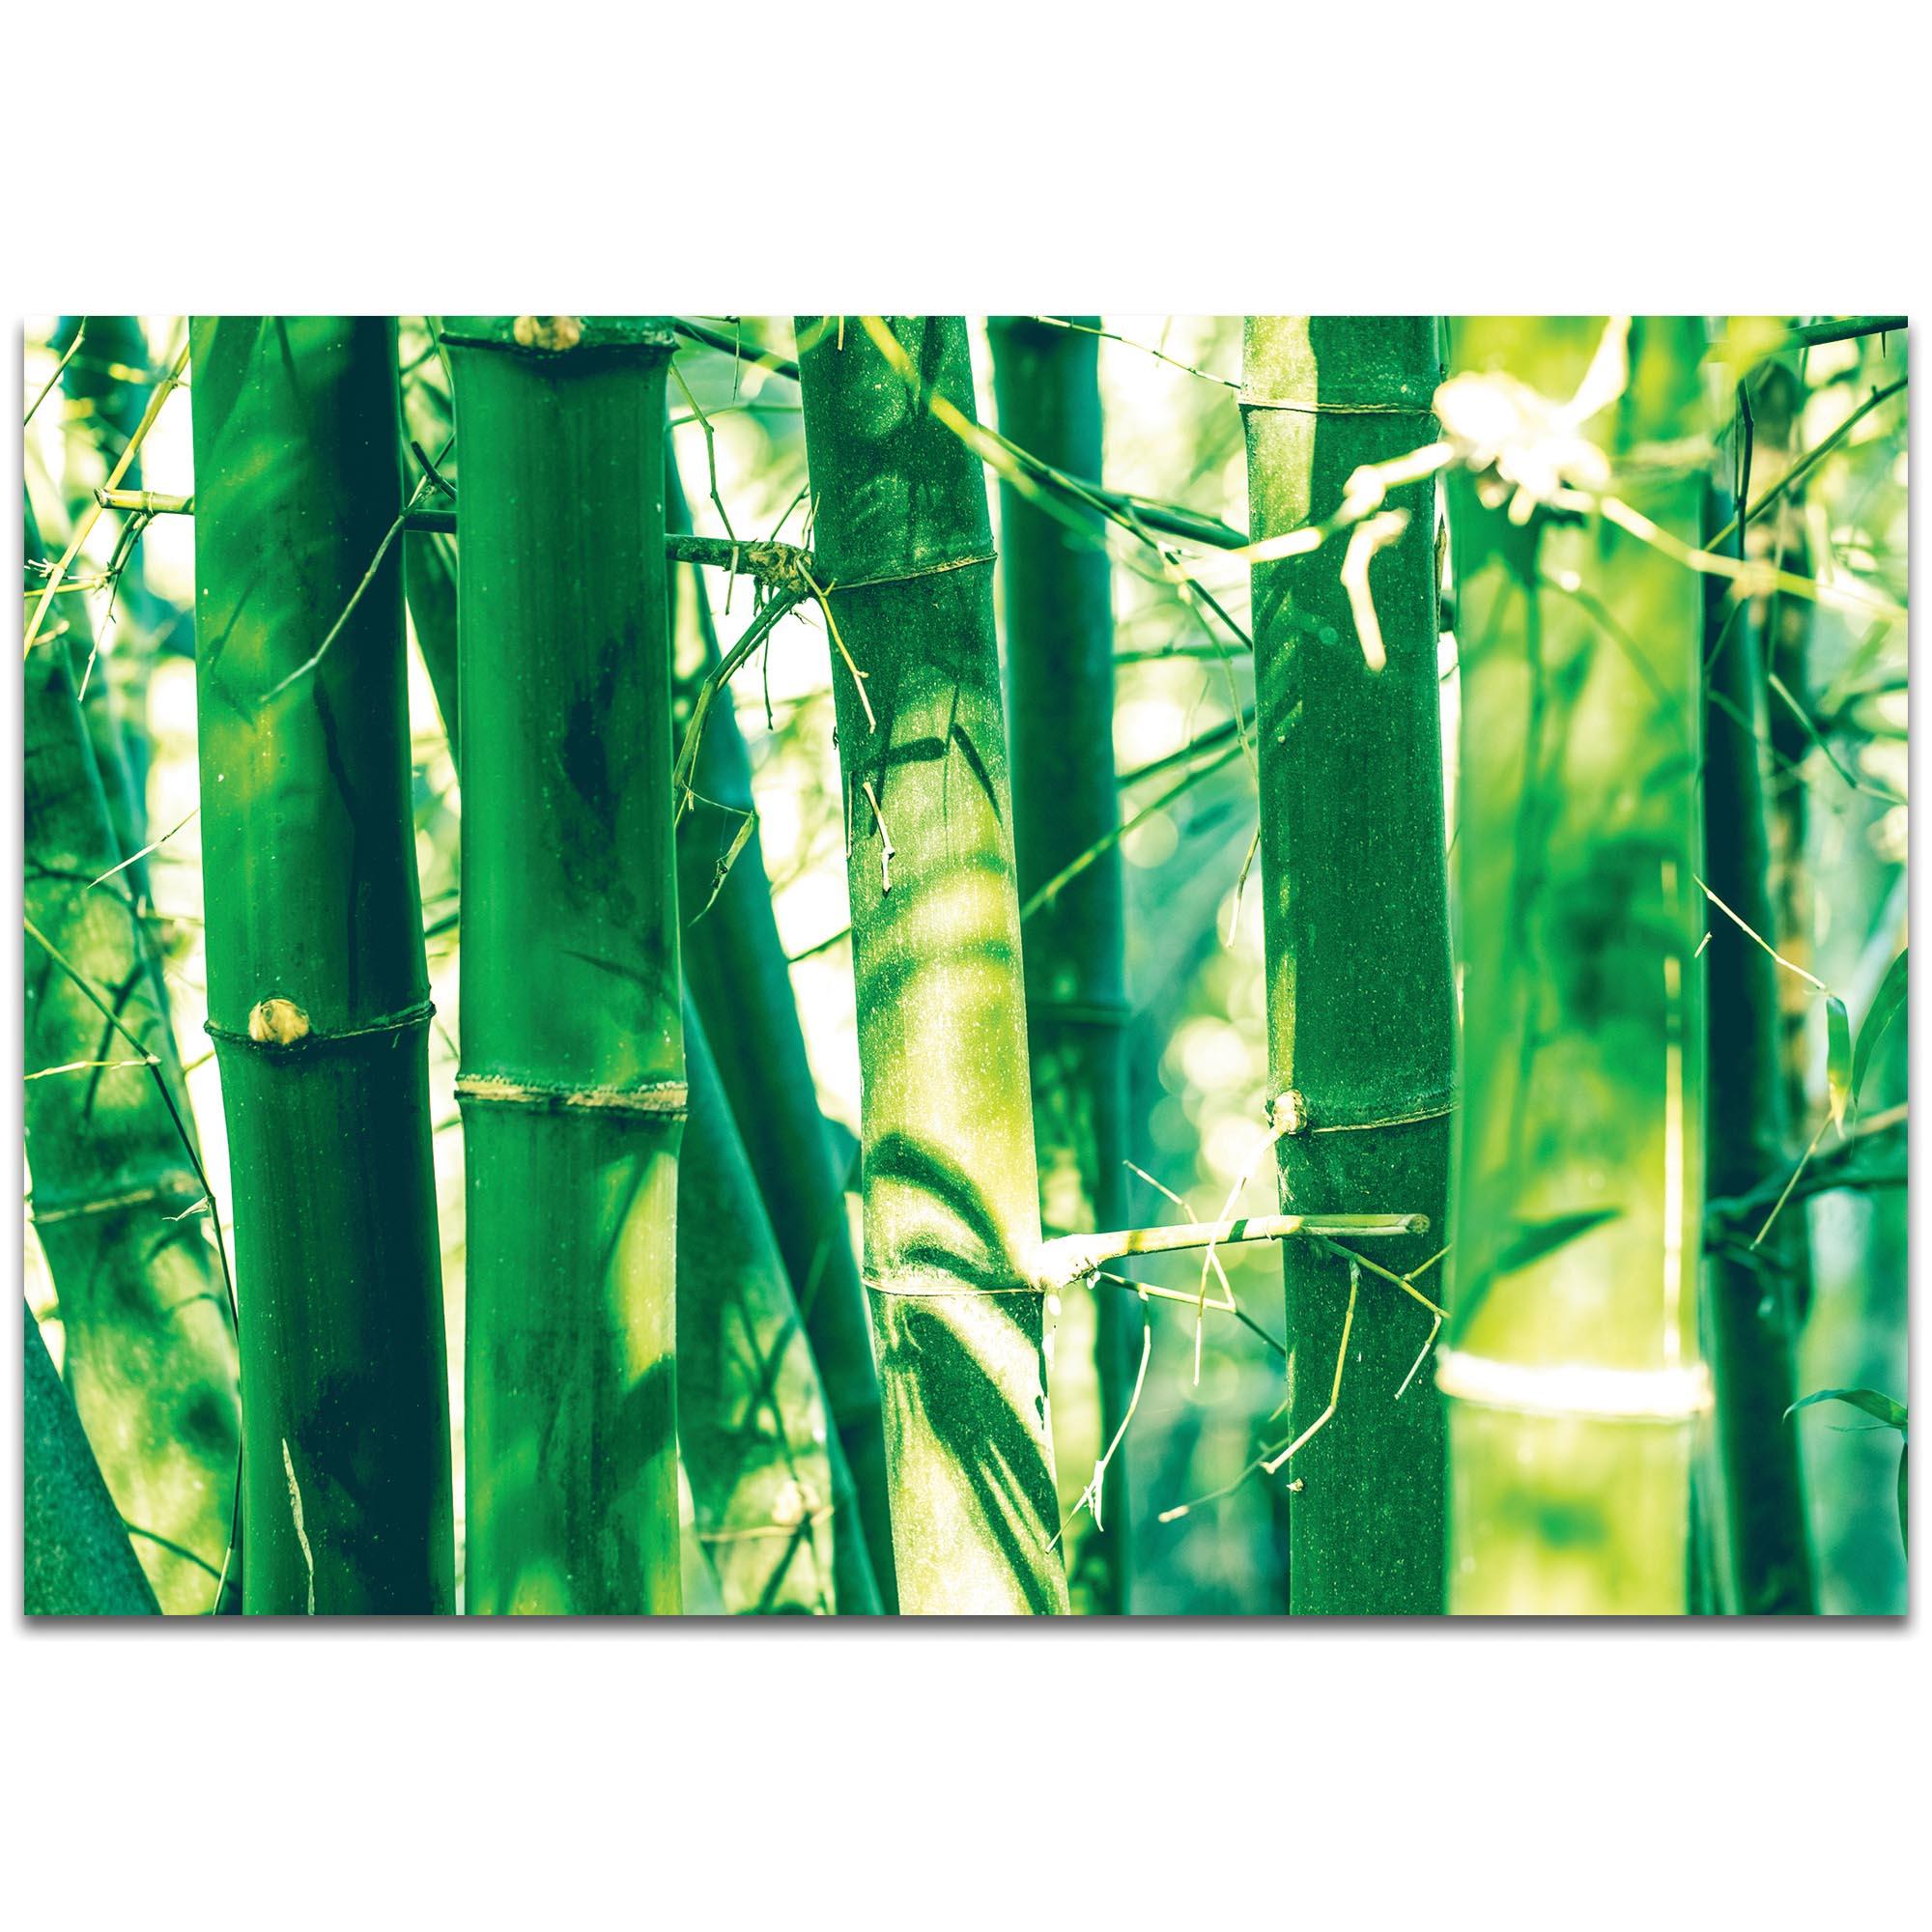 Asian Wall Art 'Bamboo Forest' - Bamboo Decor on Metal or Plexiglass